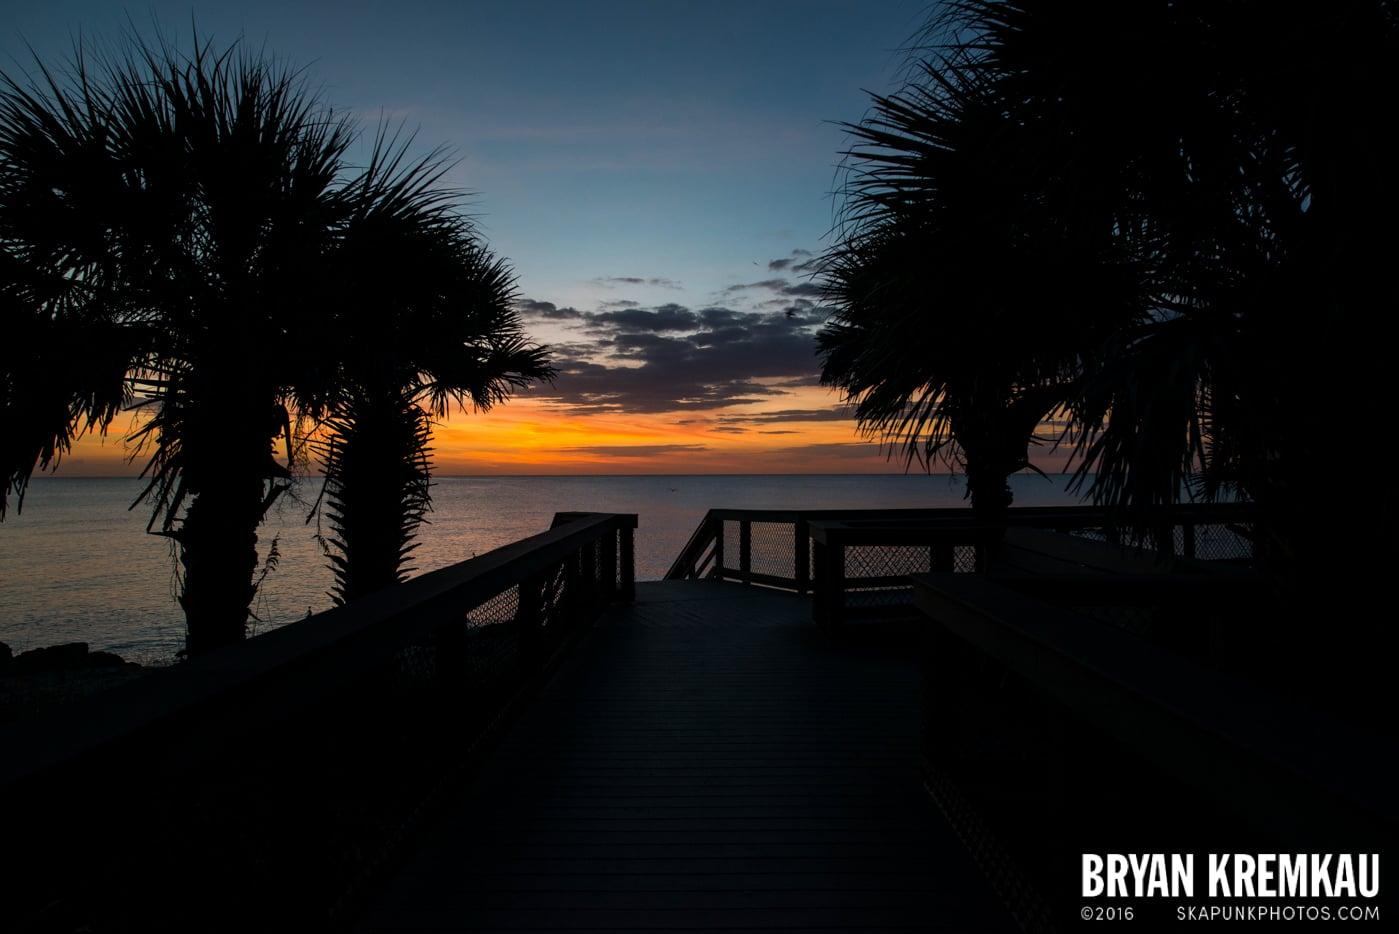 Sunsets, Astrophotography & Birds @ Venice, Florida - 10.25.14 - 11.5.14 (59)